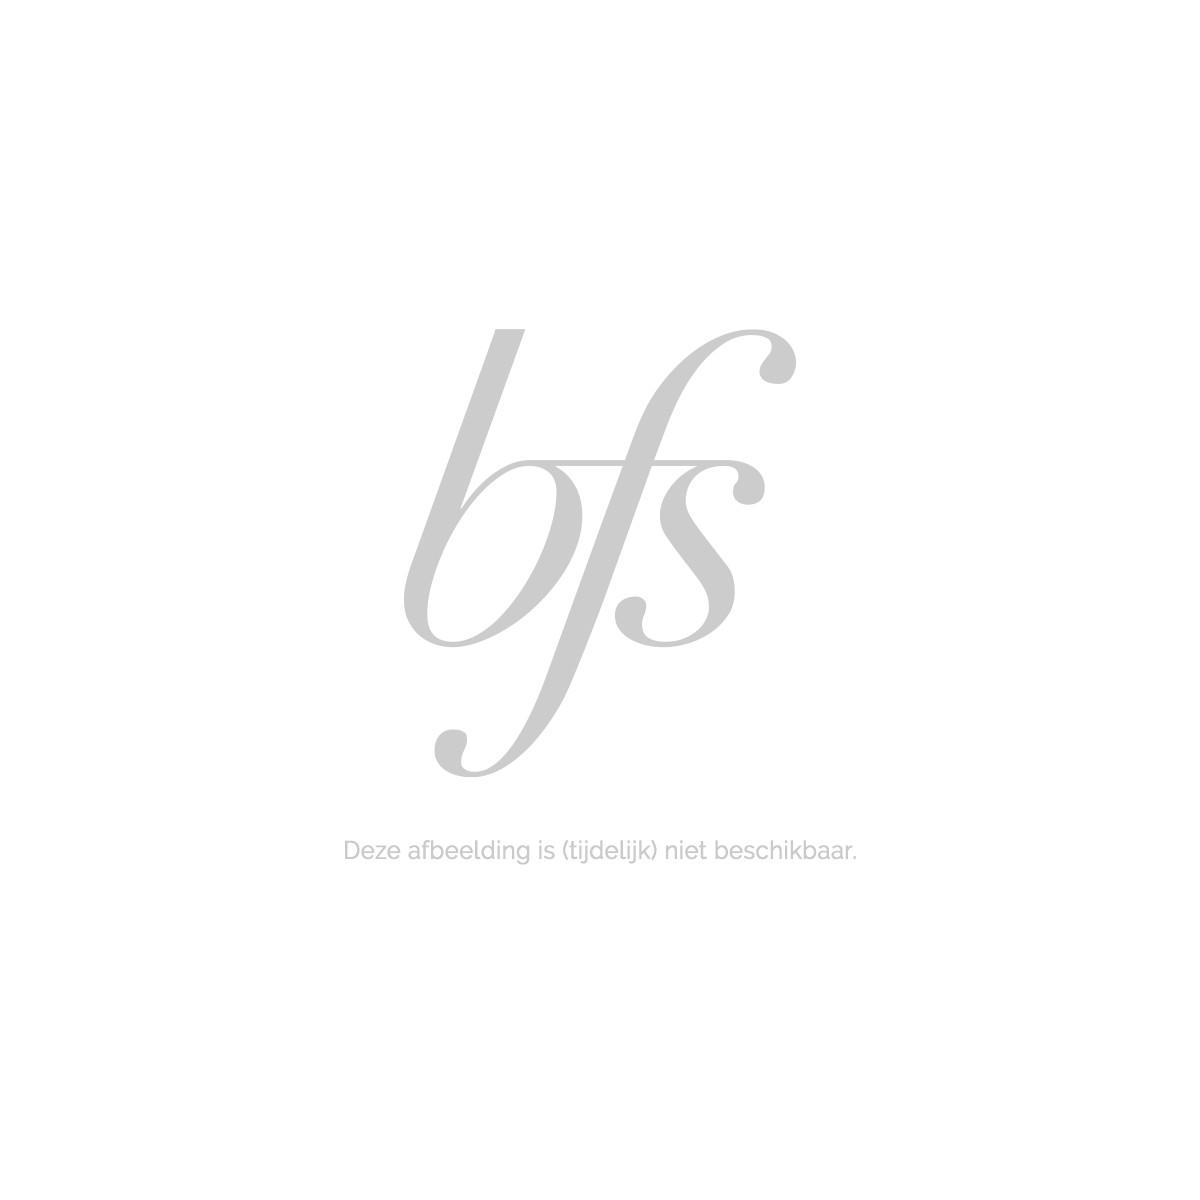 Christian Dior Diorliner Precision Eyeliner 1,35 Ml